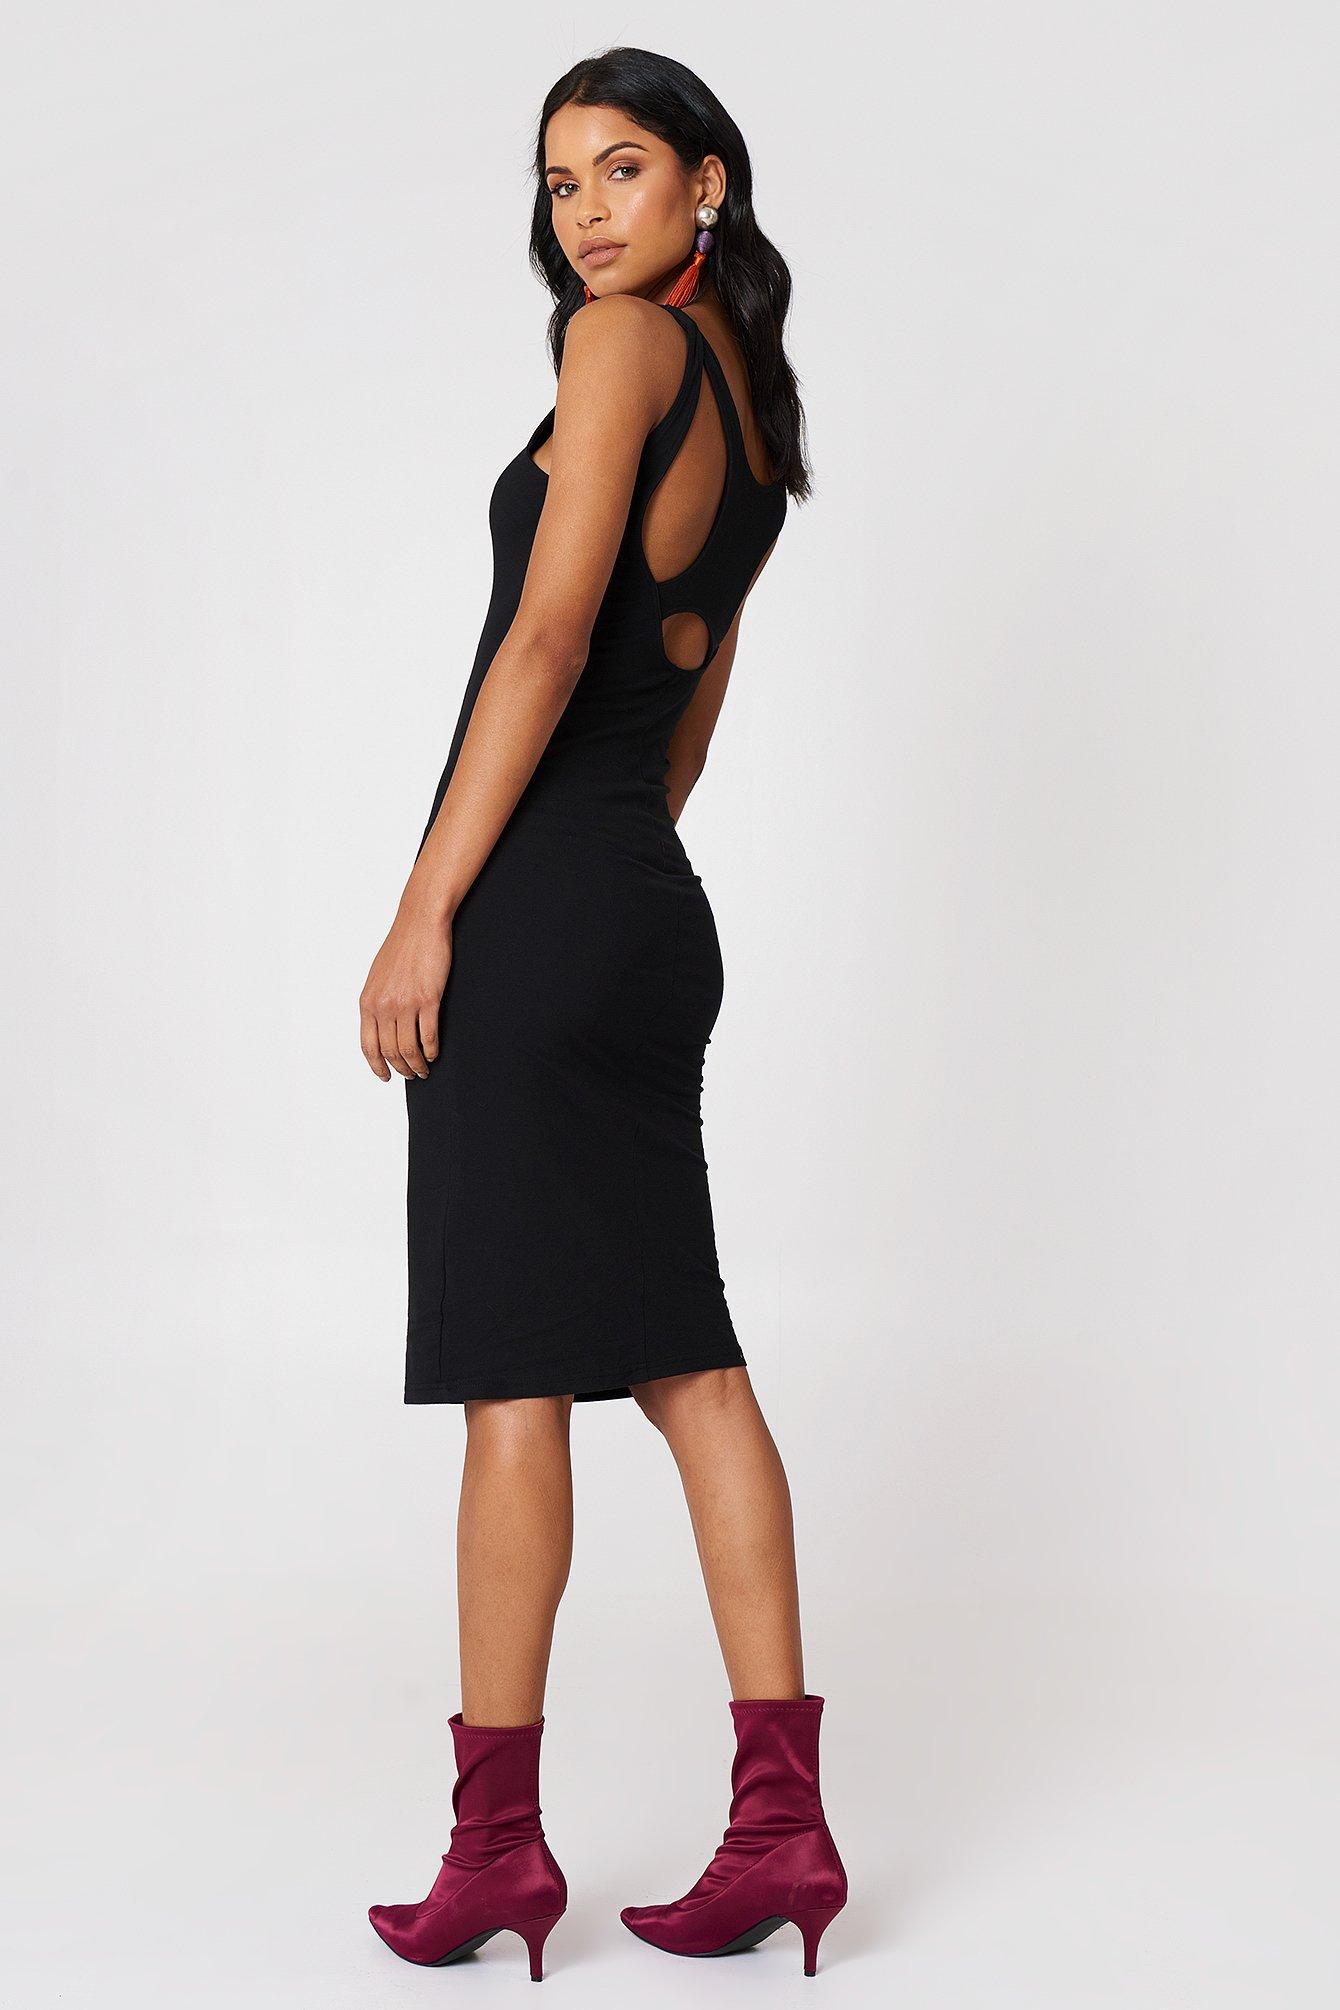 DIVE DRESS - BLACK